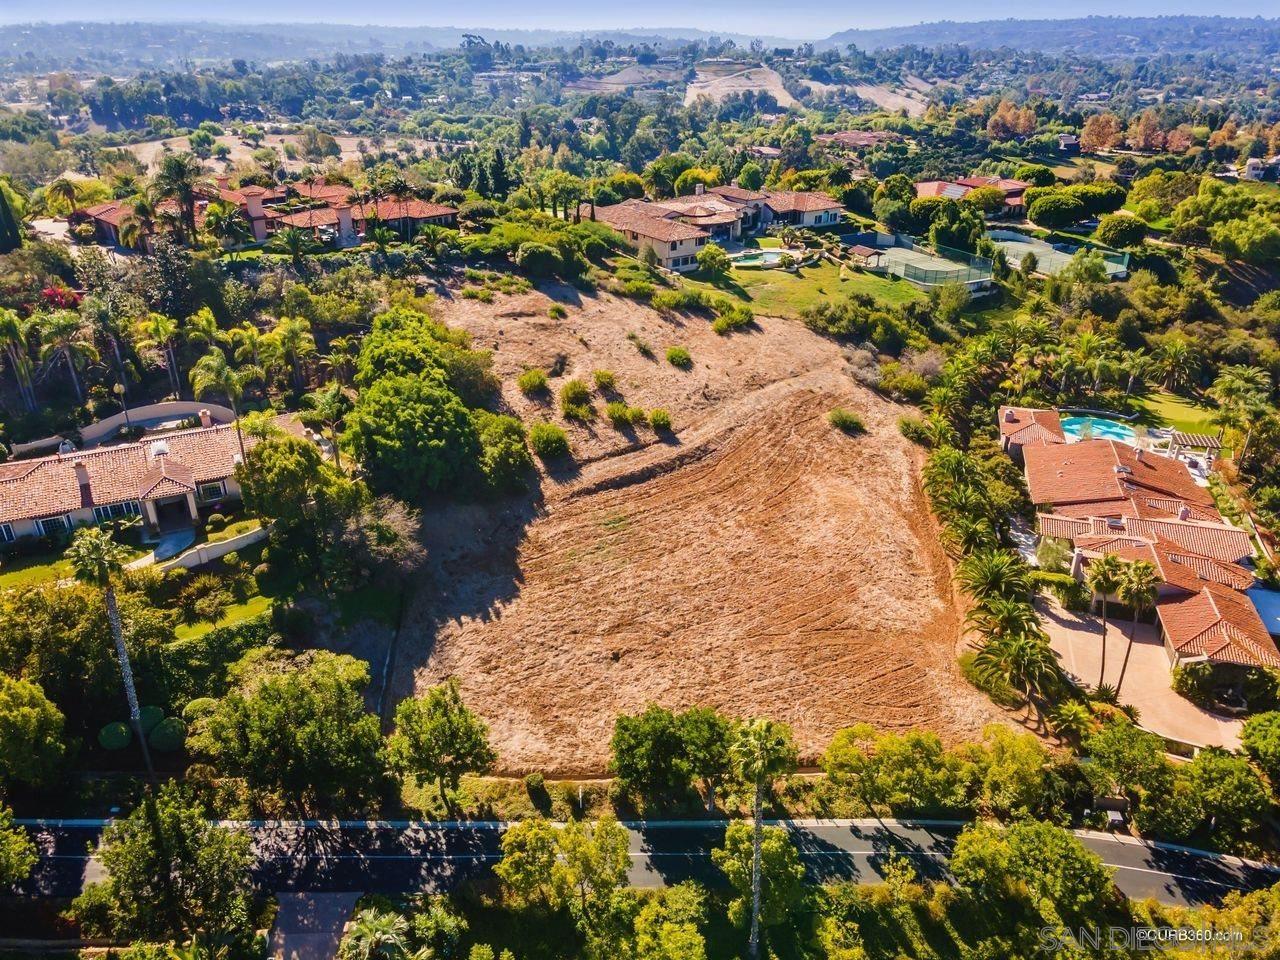 Photo of 18174 Via Ascenso, Rancho Santa Fe, CA 92067 (MLS # 200051193)